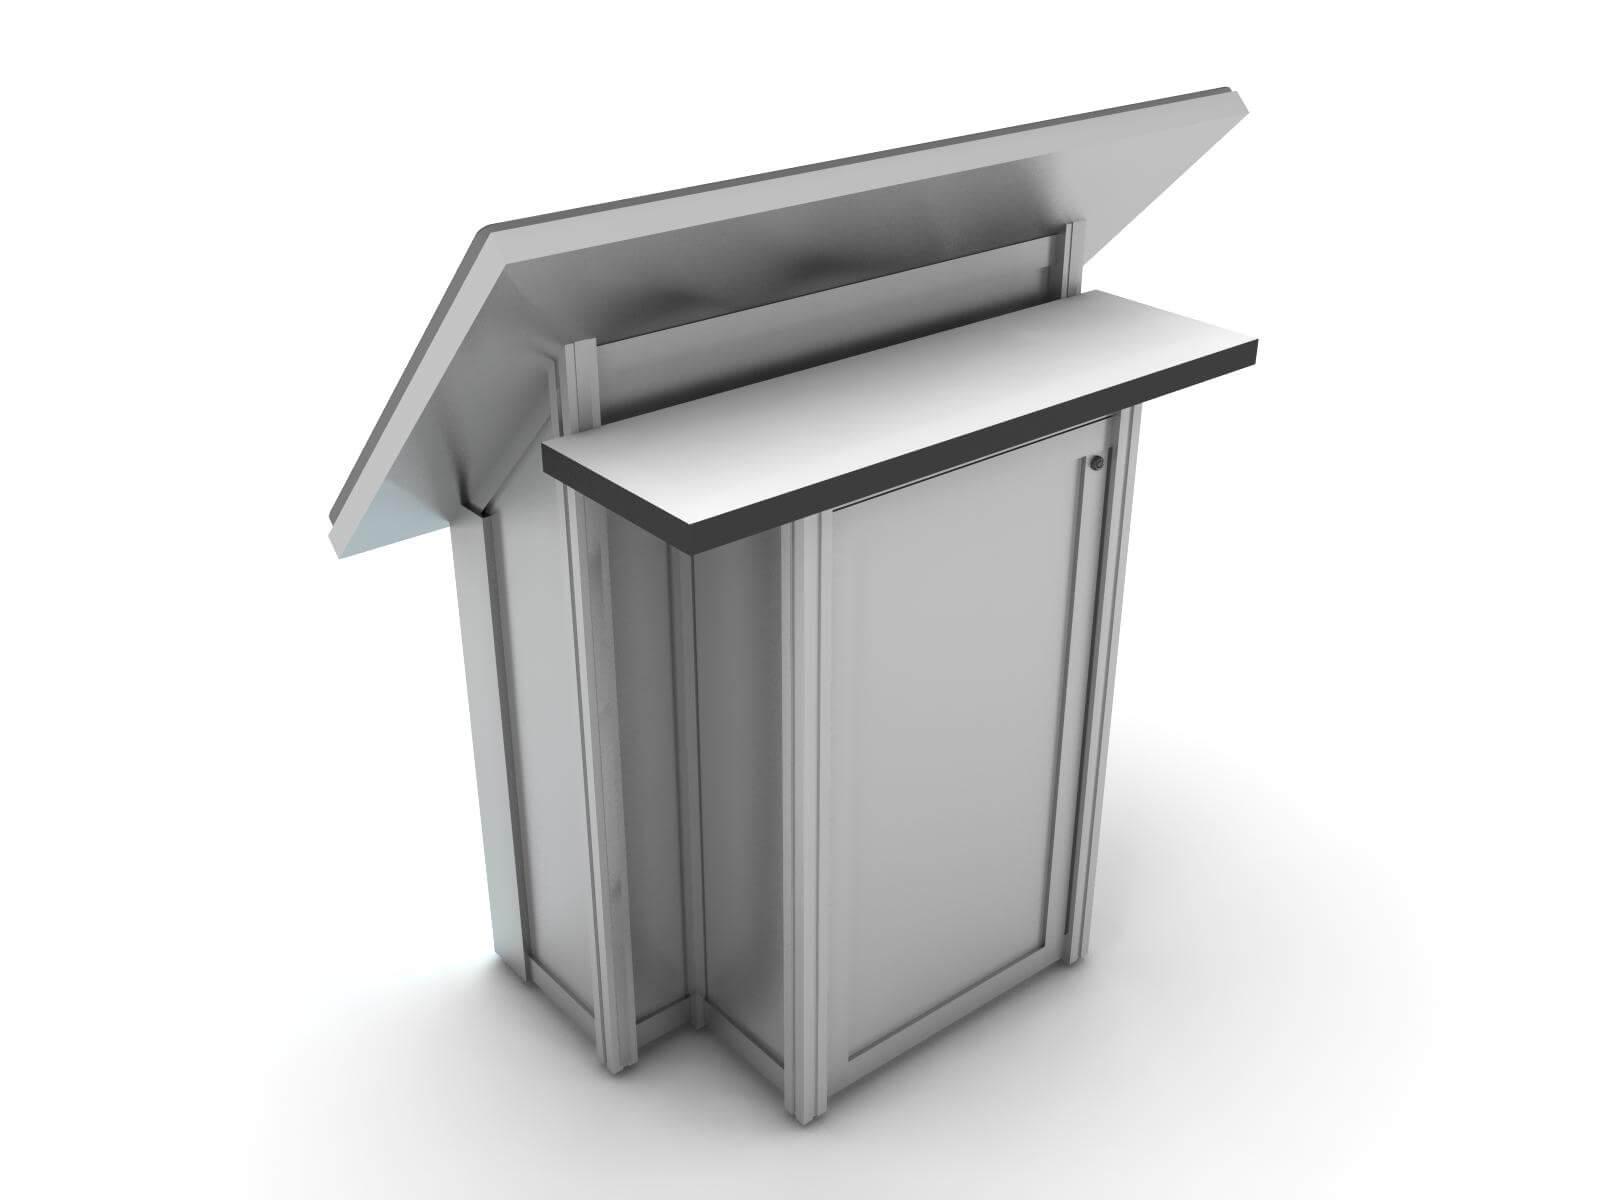 MOD-1710 Interactive Kiosk Fixture - image 3